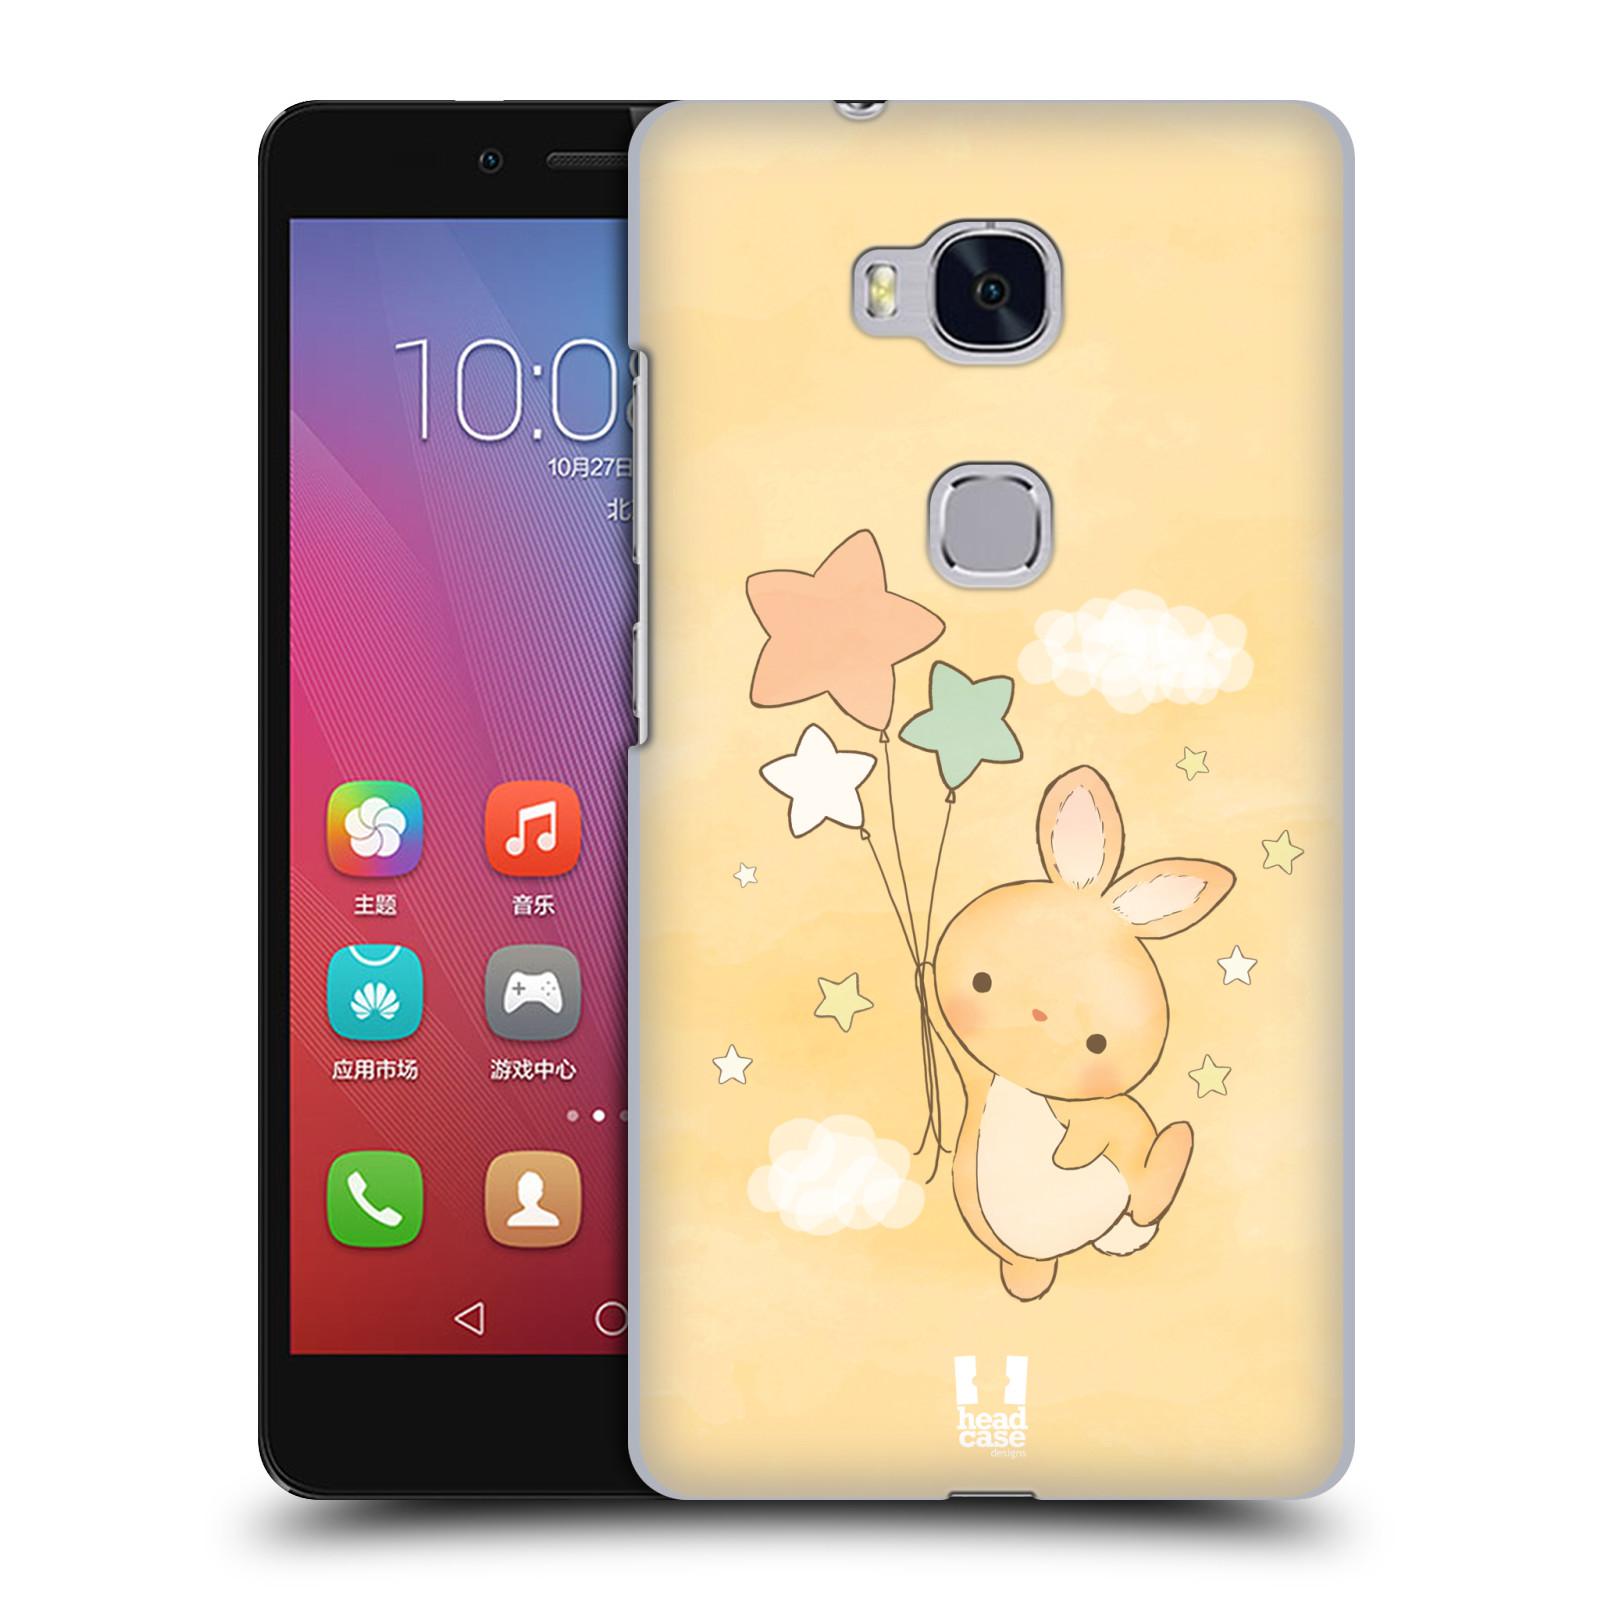 HEAD CASE pevný plastový obal na mobil HUAWEI HONOR 5X vzor králíček a hvězdy žlutá